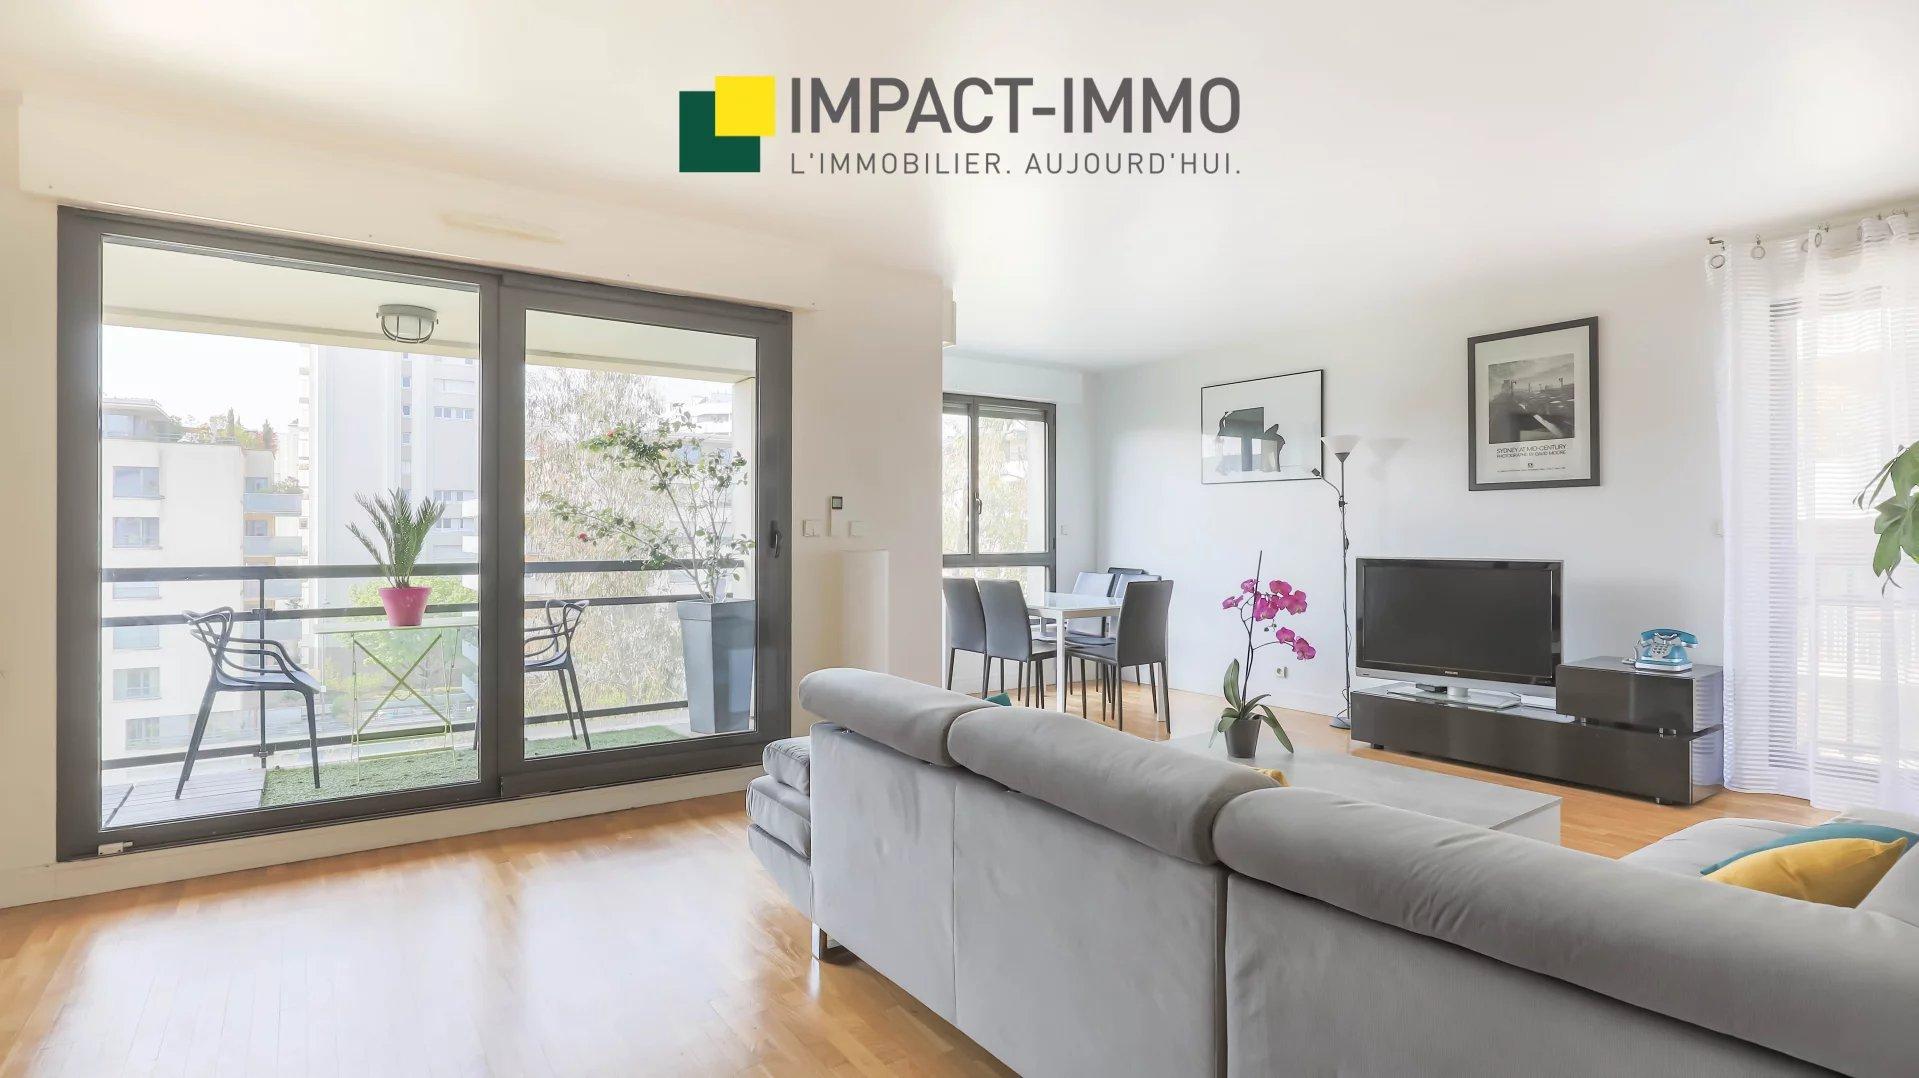 IMPACT IMMO LEVALLOIS - A VENDRE - 5 PIÈCES - BALCONS TERRASSES -PROCHE 17 EME